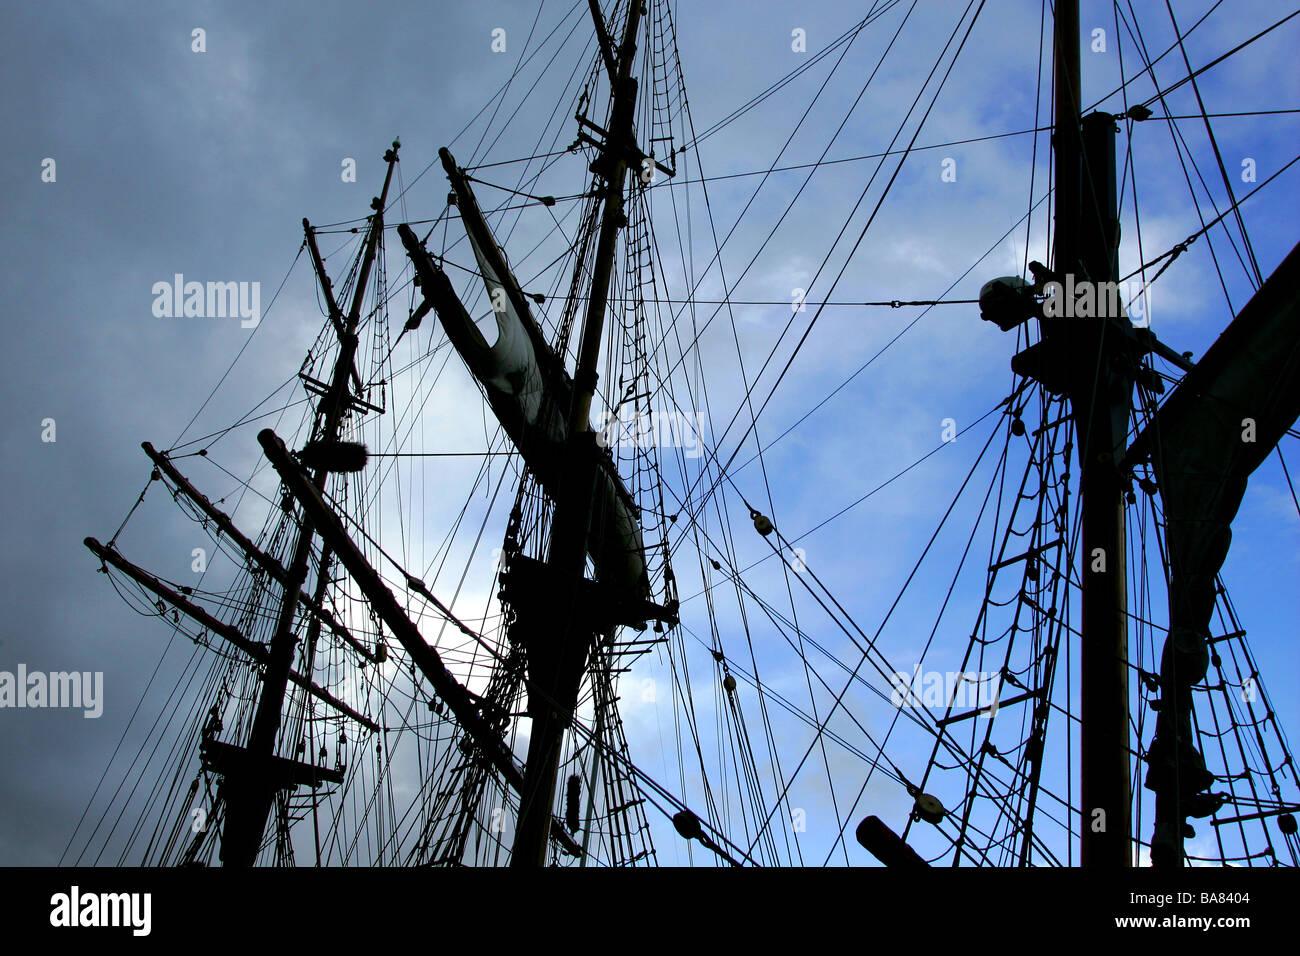 rigging - Stock Image